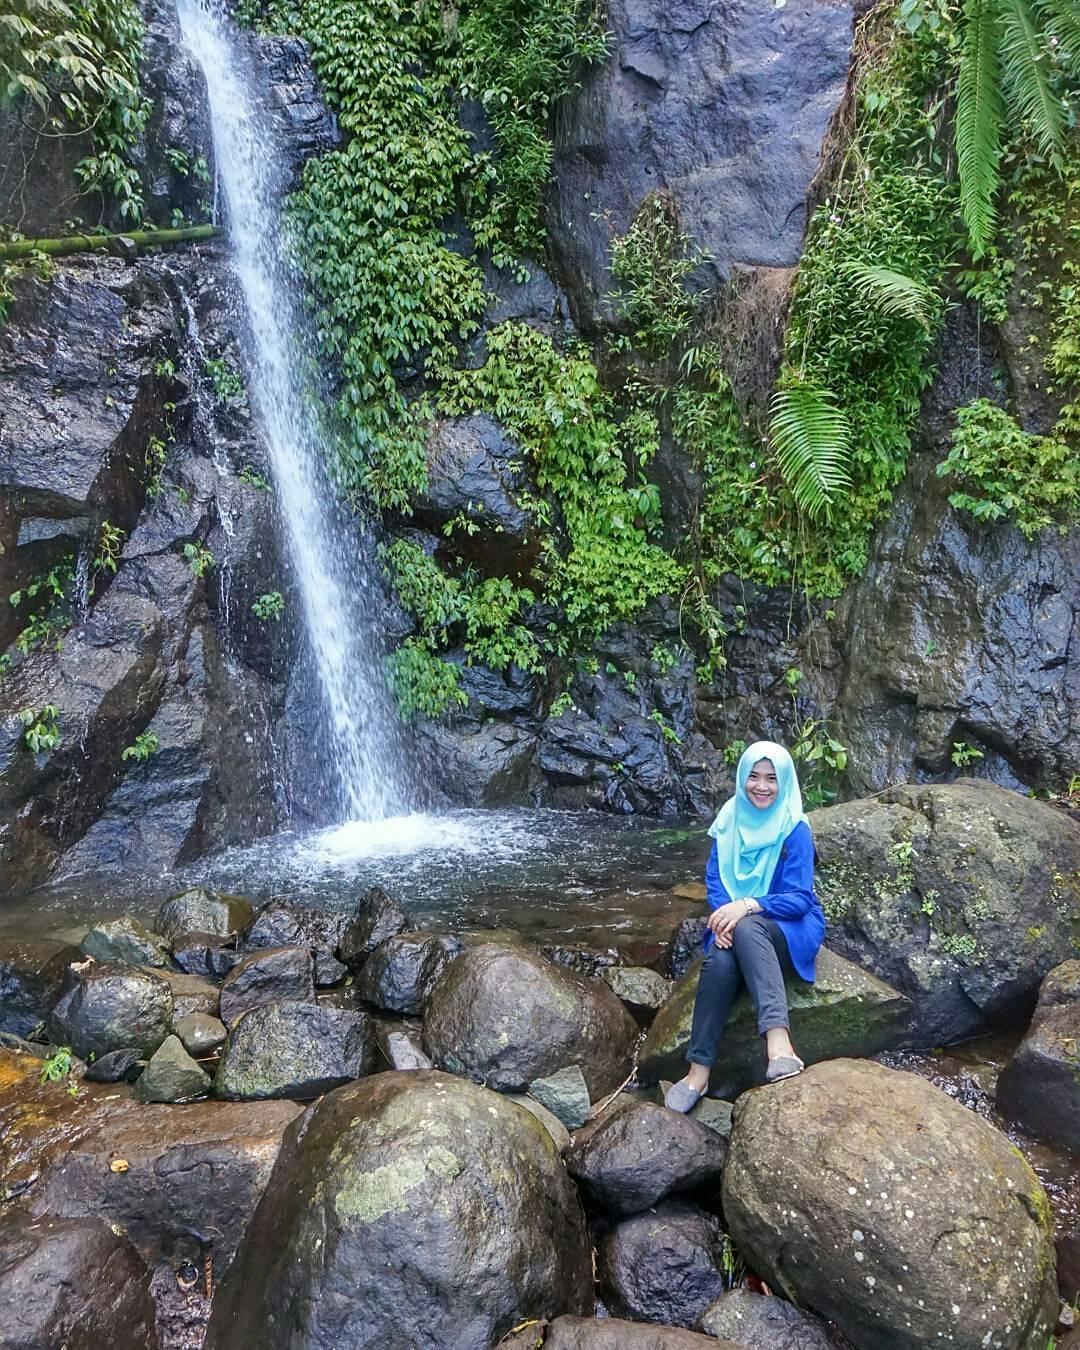 37 Obyek Wisata Purbalingga Instagramable Swamedium Curug Lawang Terletak Dusun